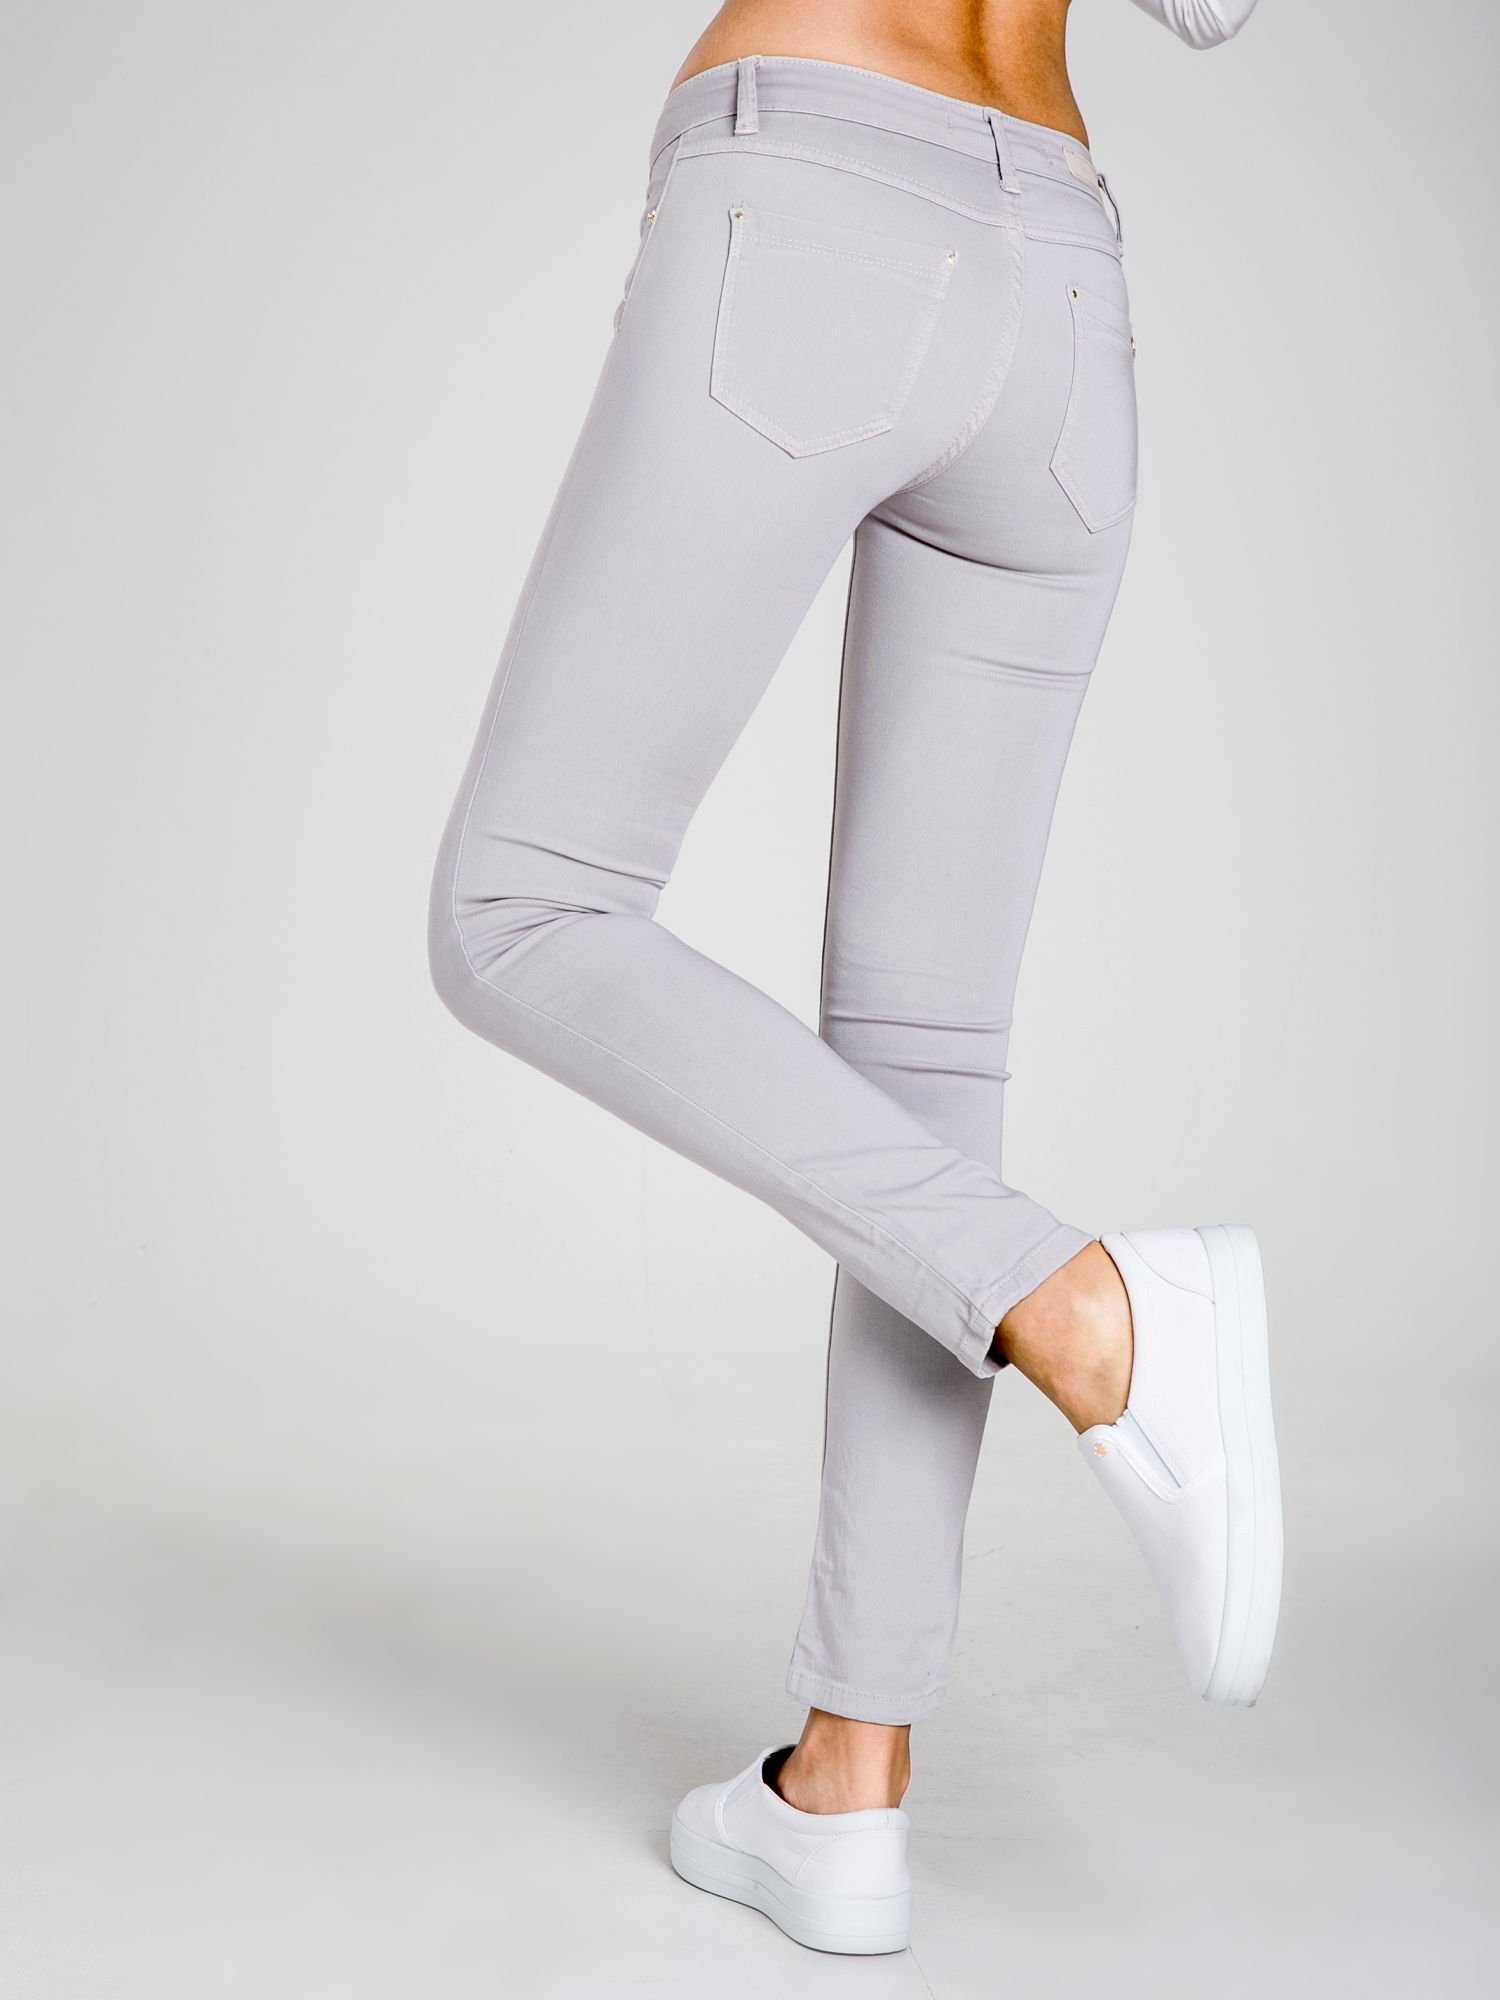 STRADIVARIUS Szare spodnie skinny typu rurki                                  zdj.                                  2